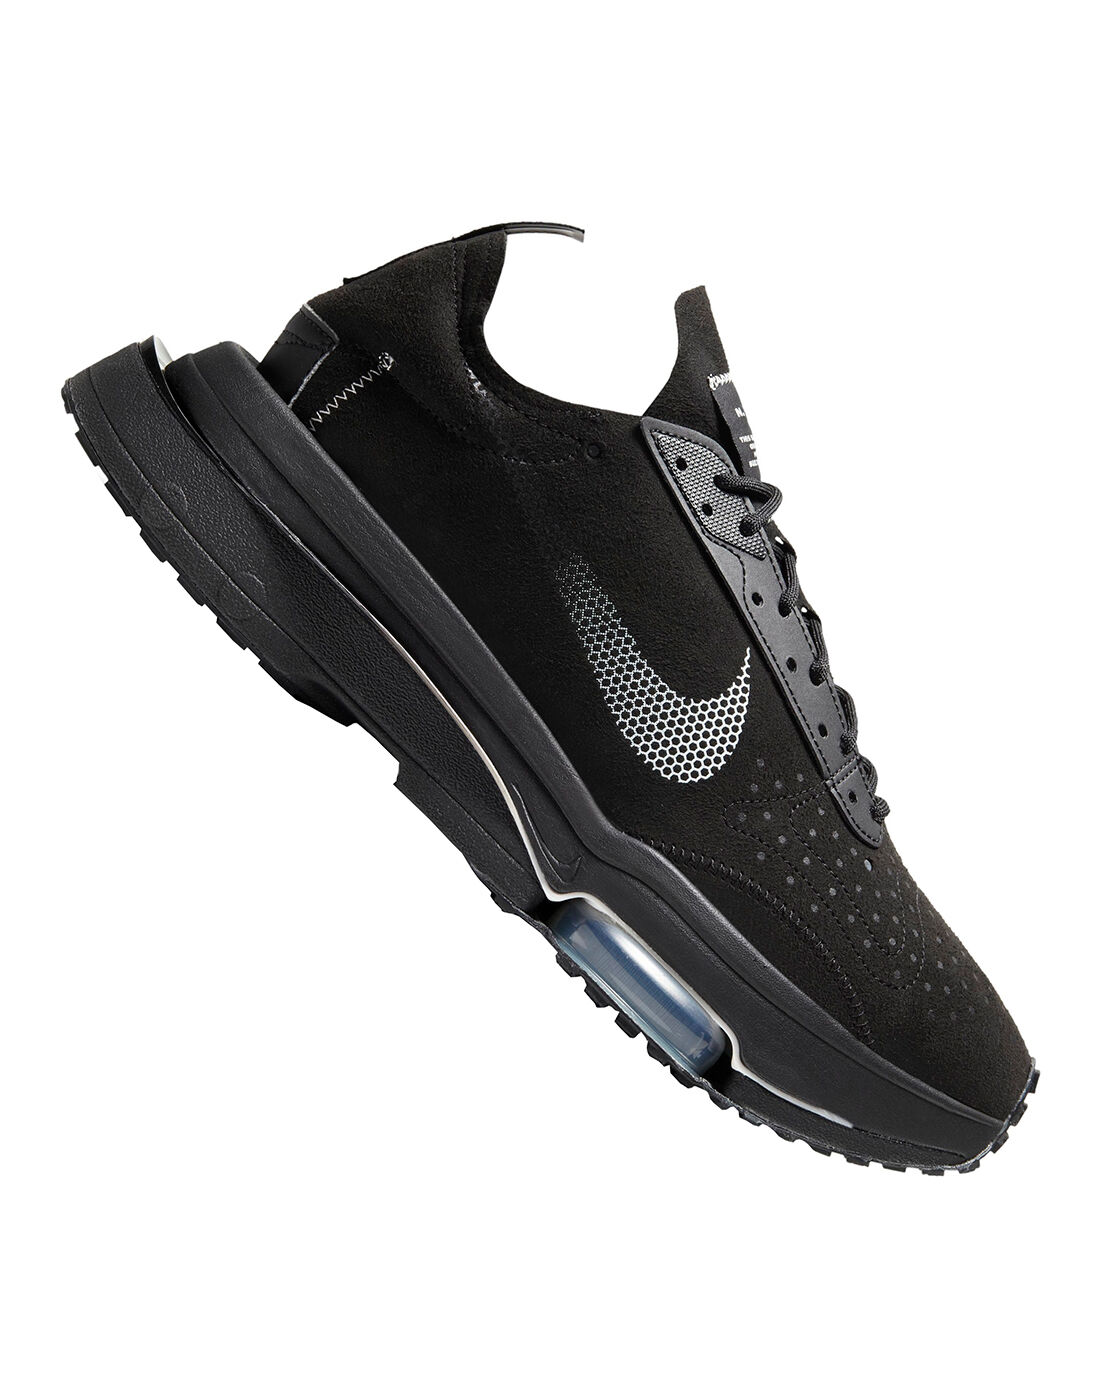 Nike Mens Air Zoom Type - Black | adidas extaball homme perfume ...